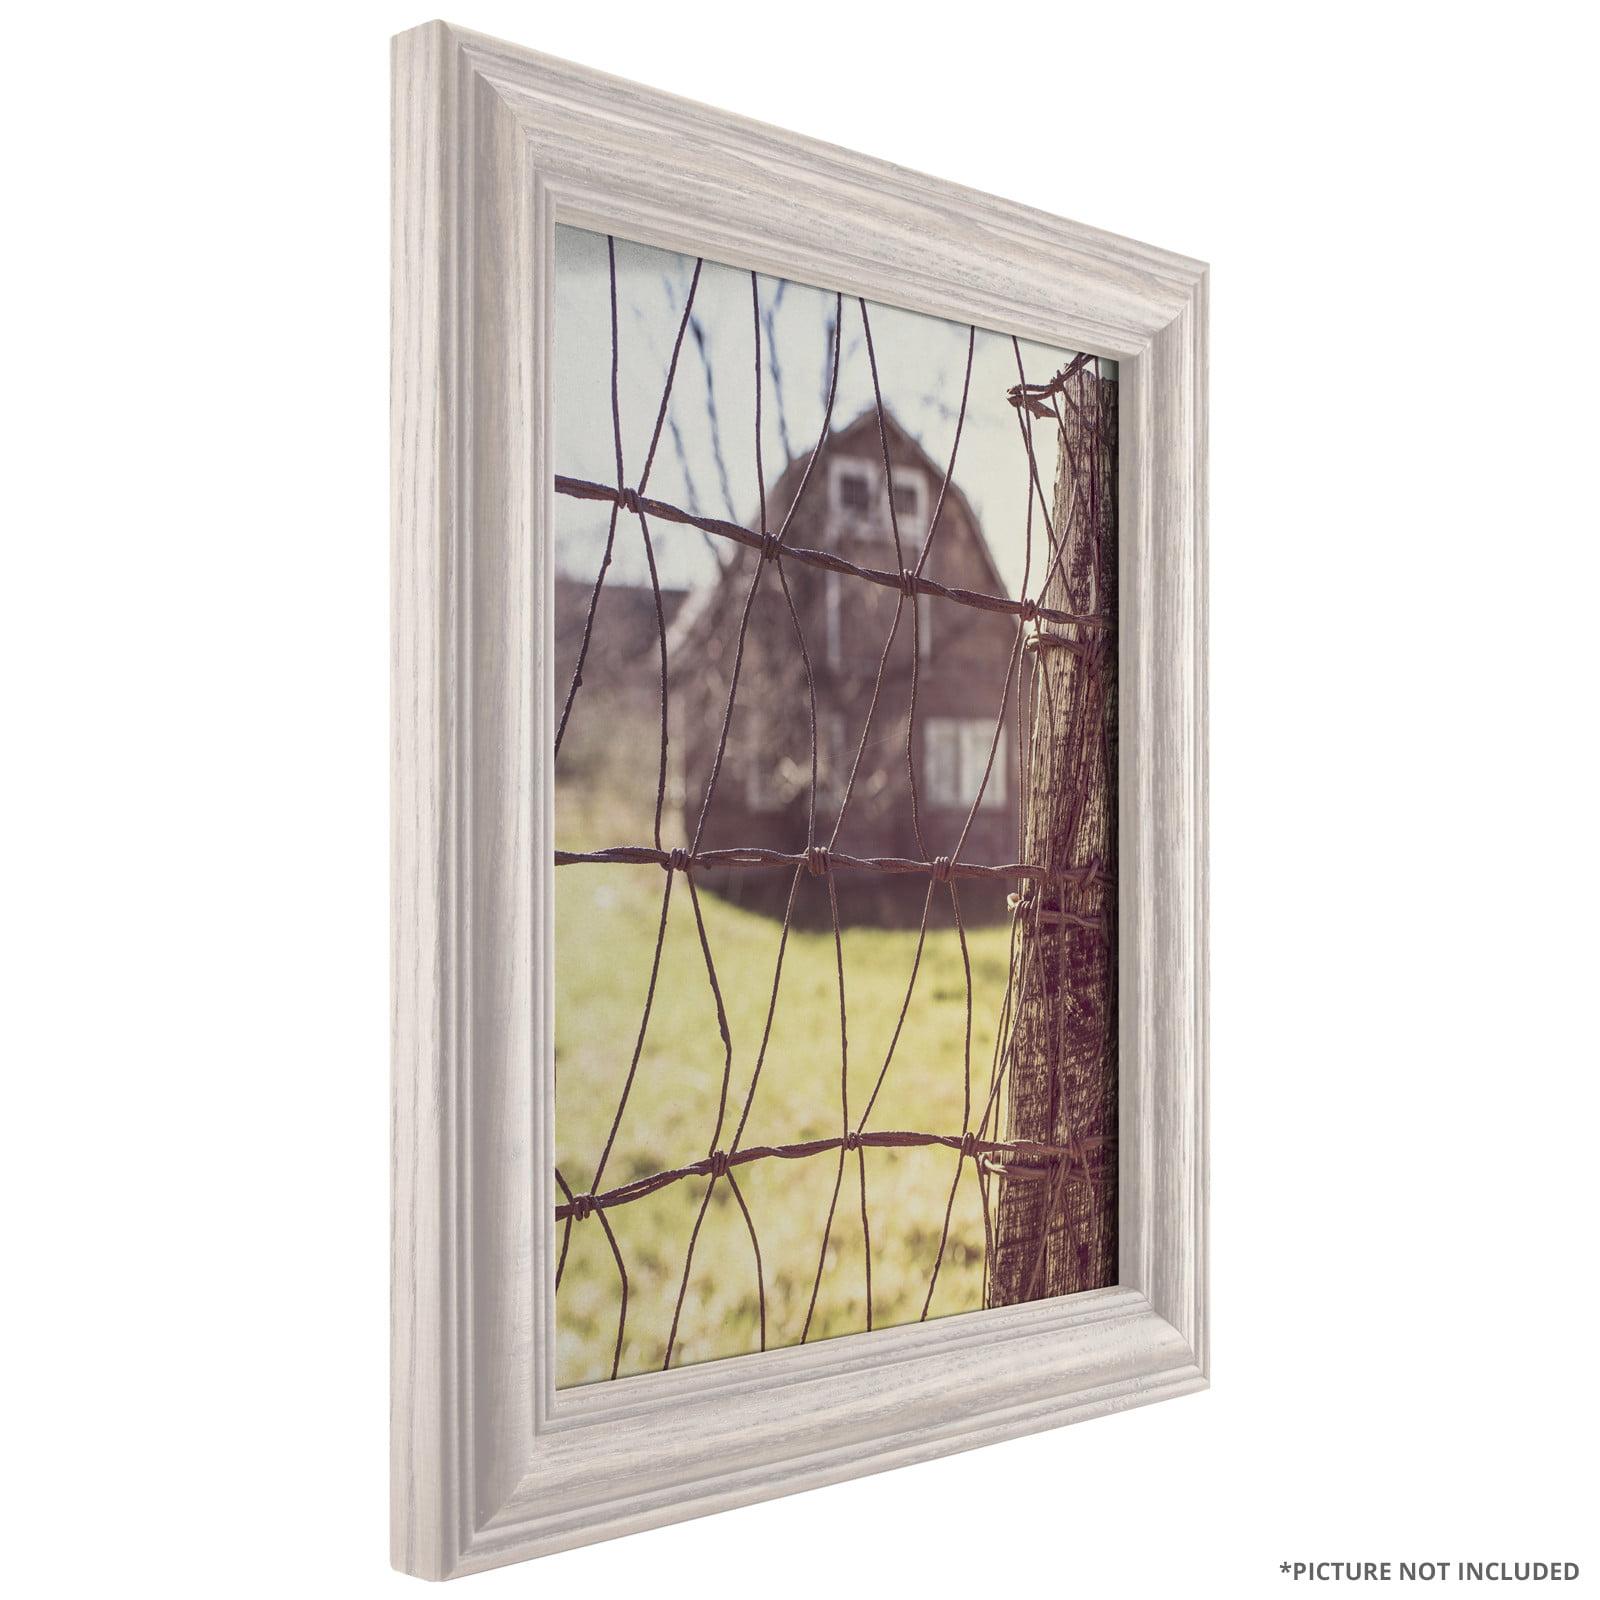 Craig Frames Wiltshire 440, Traditional Whitewash Hardwood Picture Frame, 20x30 Inch by Craig Frames Inc.